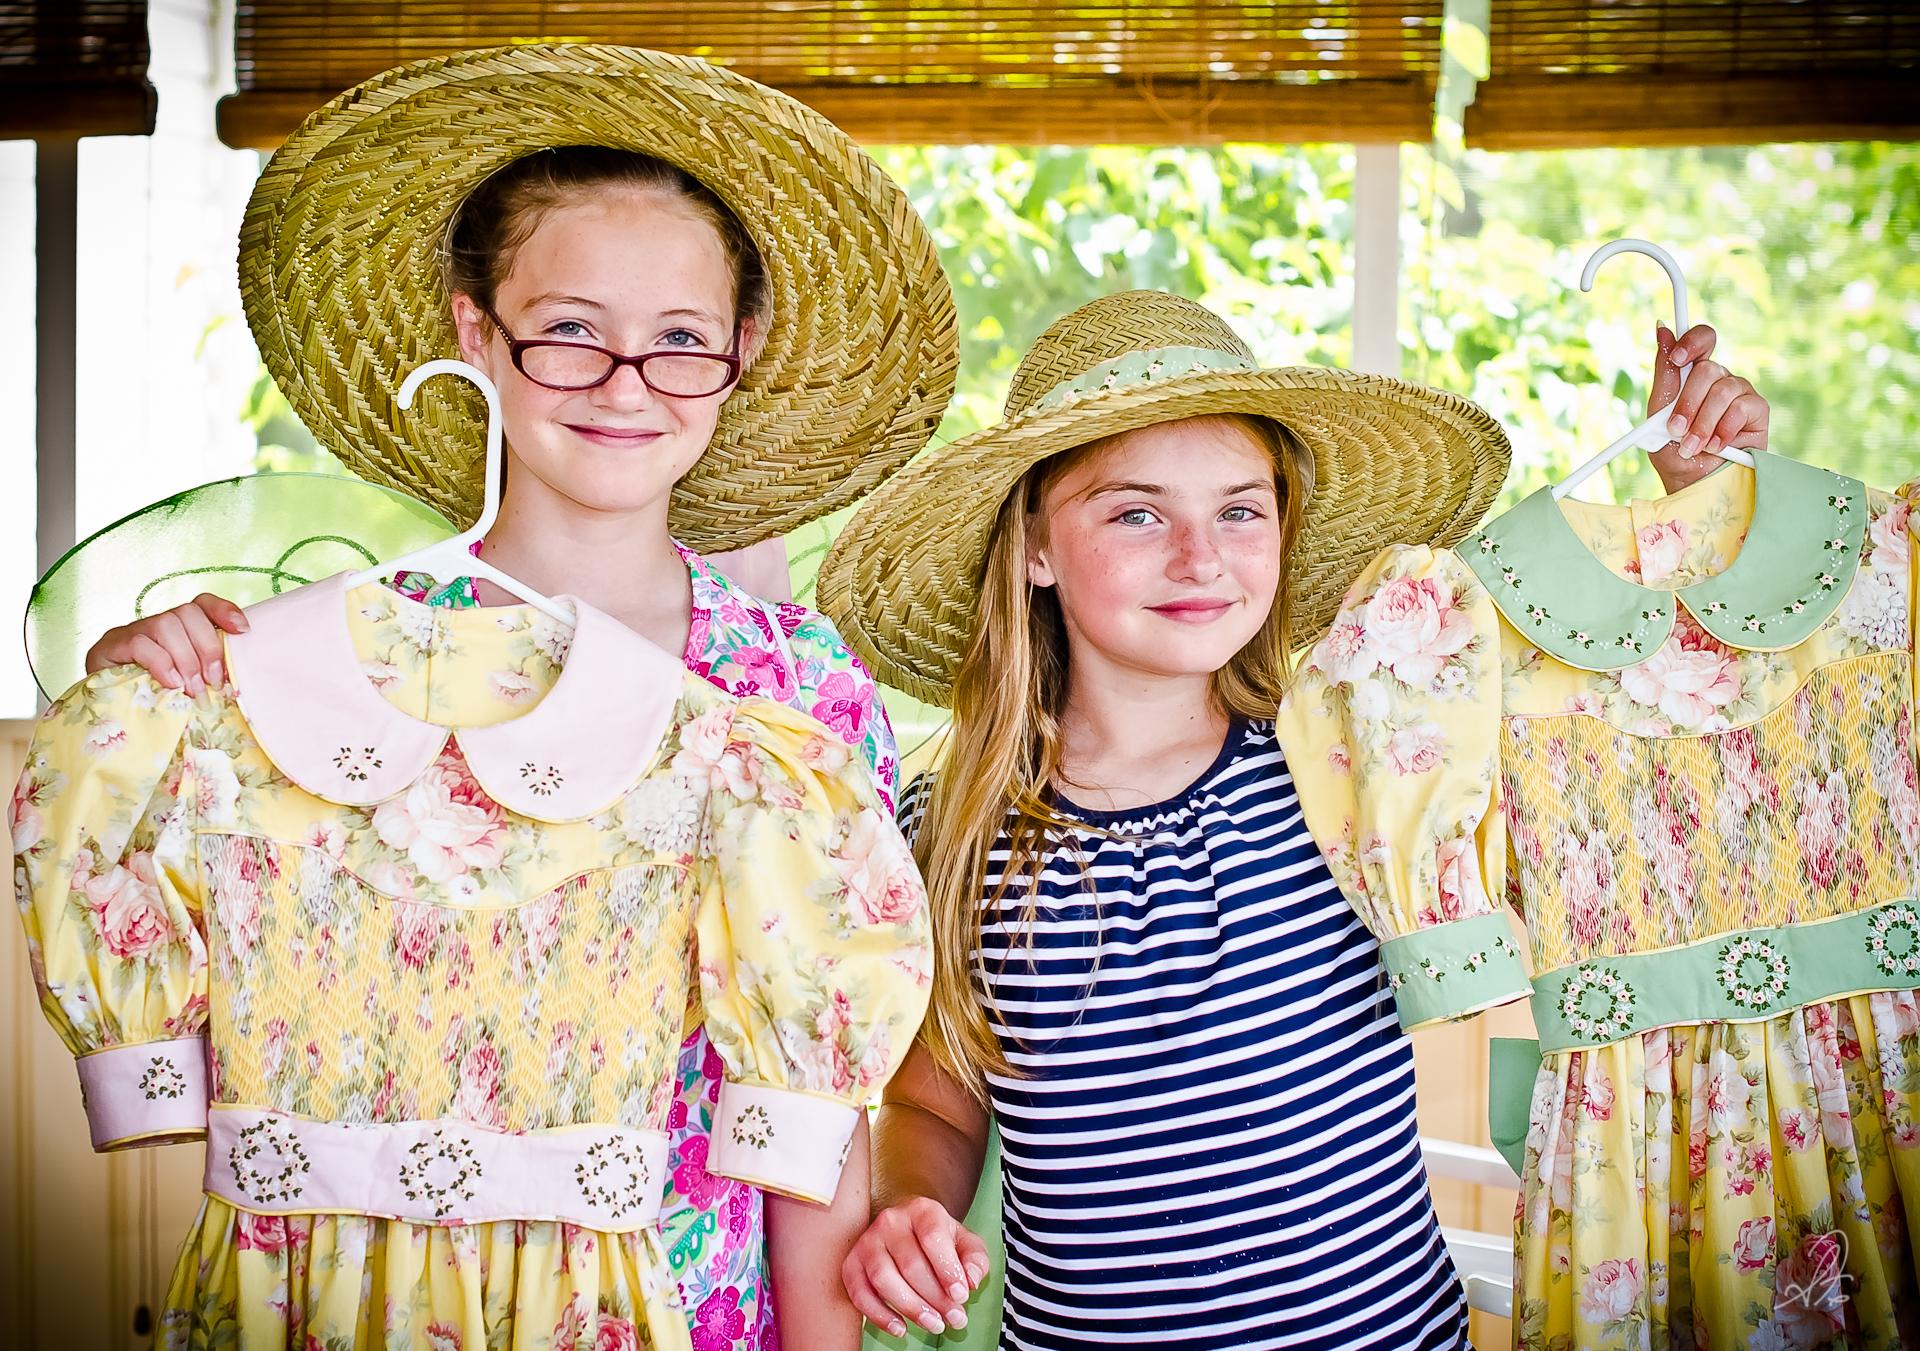 Hand Made Smocked Dresses by Deborah Fillmer